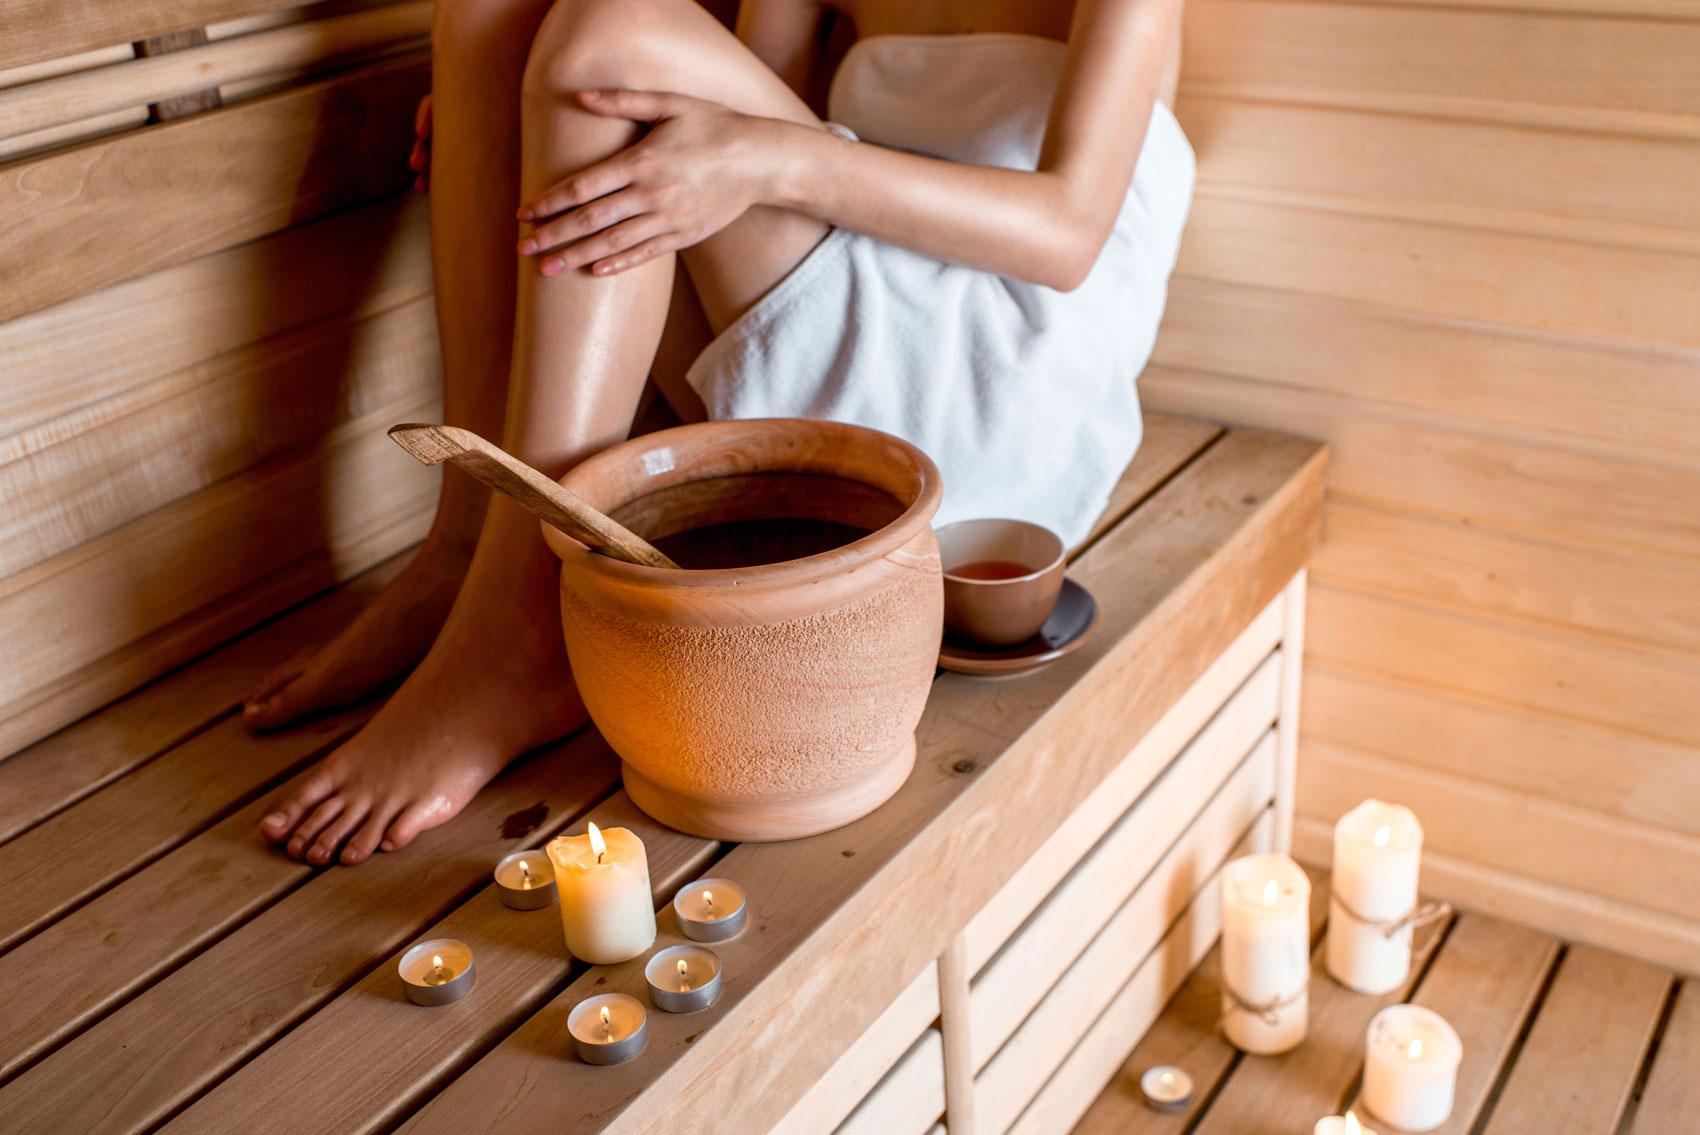 Sauna 10 regole per evitare l 39 imbarazzo - Sauna o bagno turco ...